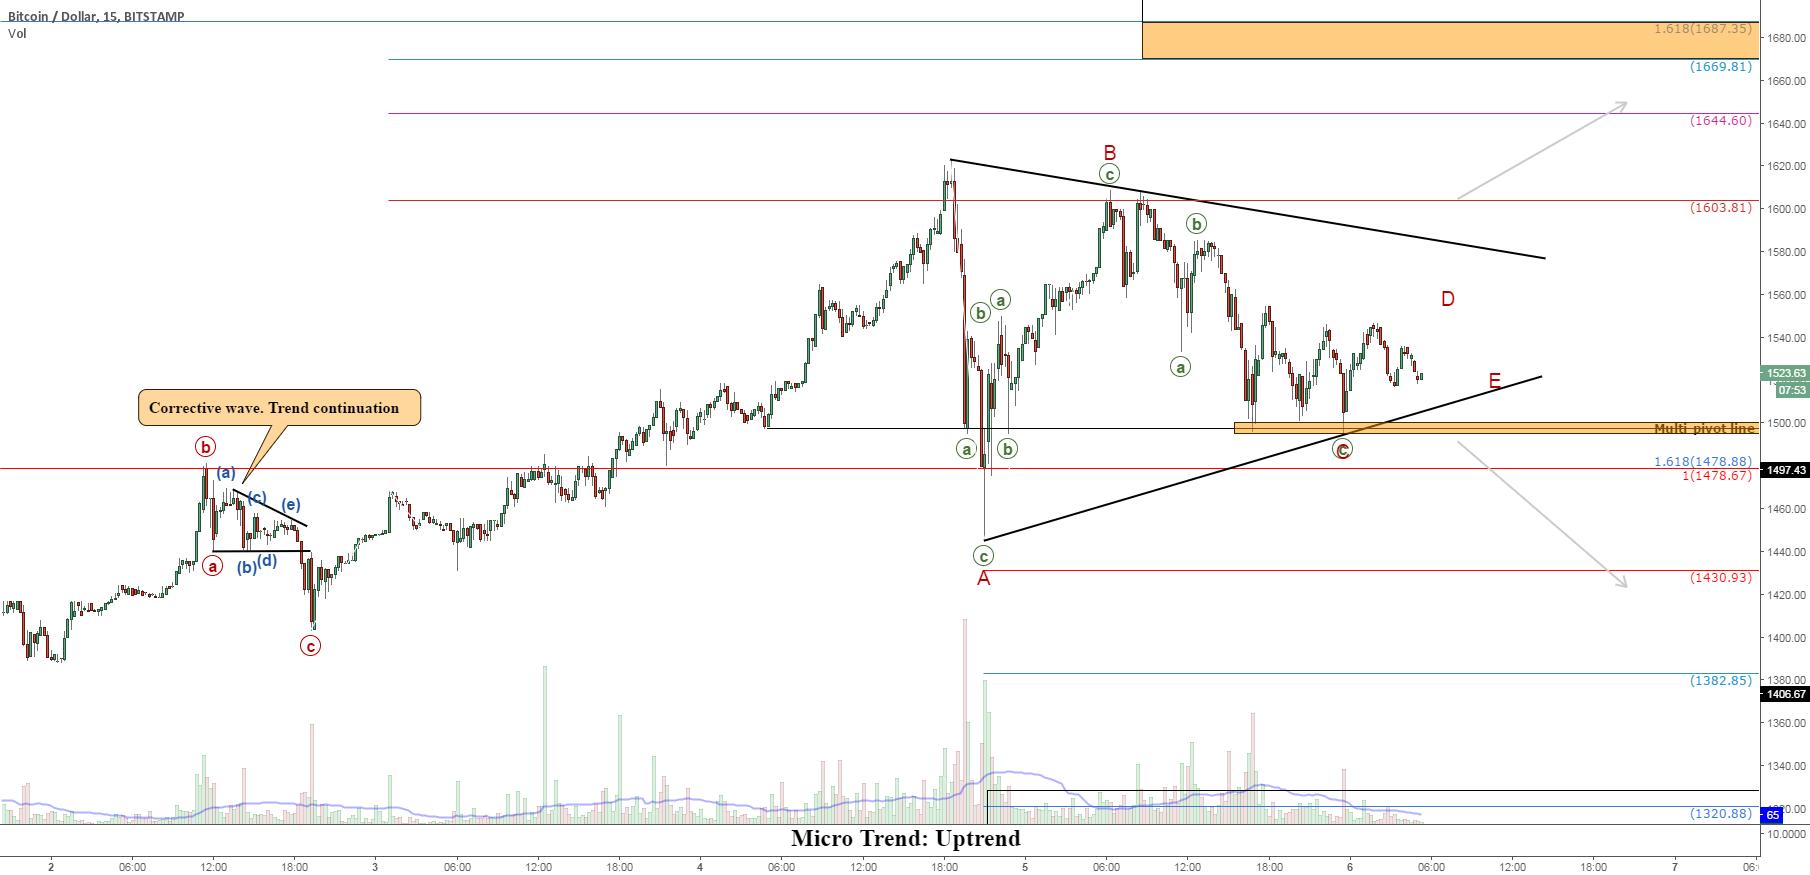 BTCUSD: Short-Term Triangular Price Action